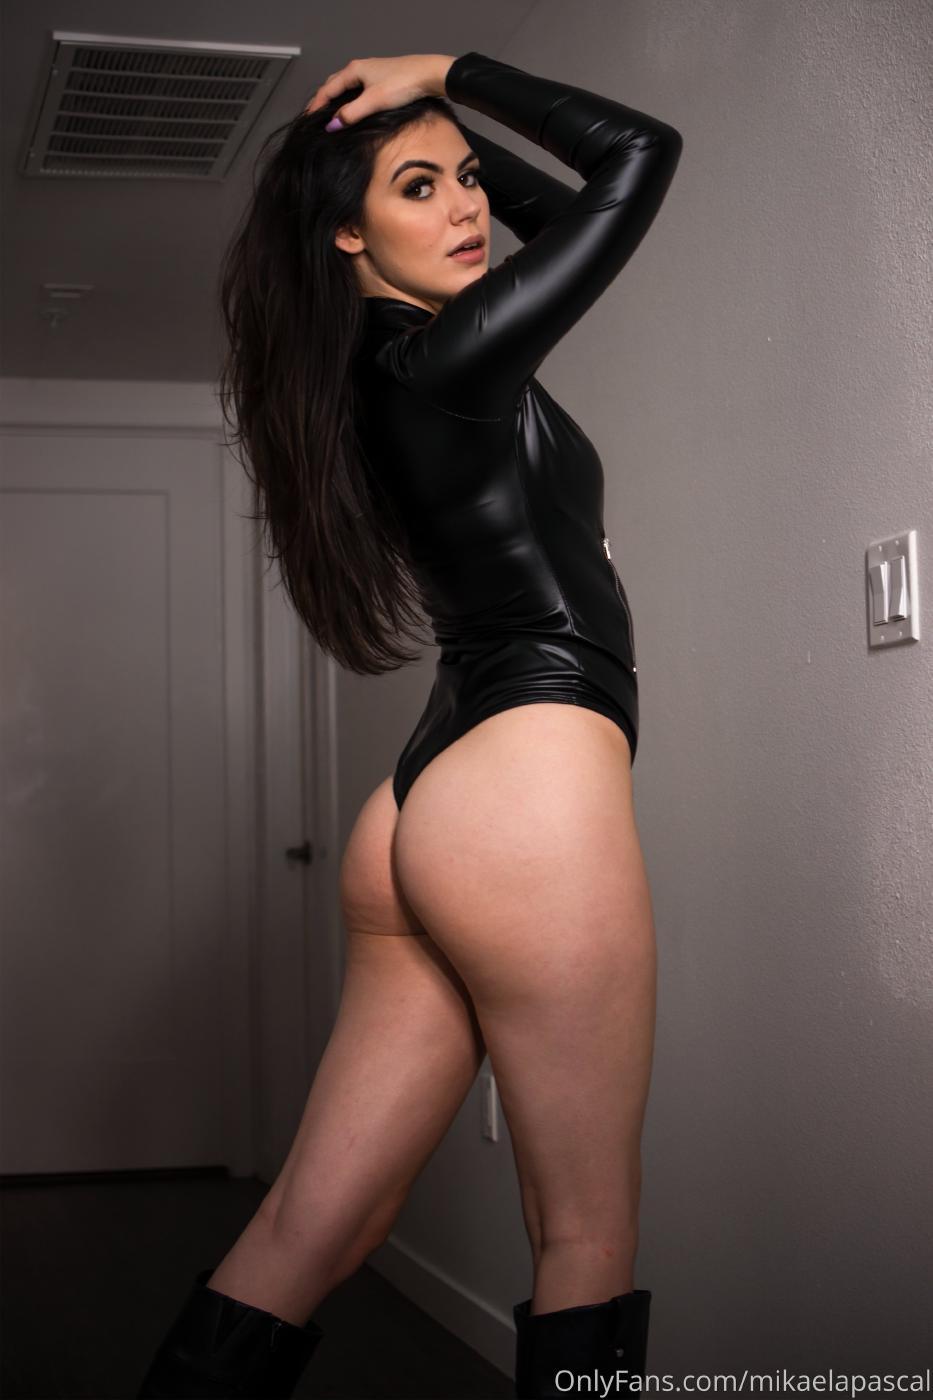 Mikaela Pascal Sexy Leather Bodysuit Onlyfans Set Leaked 0019